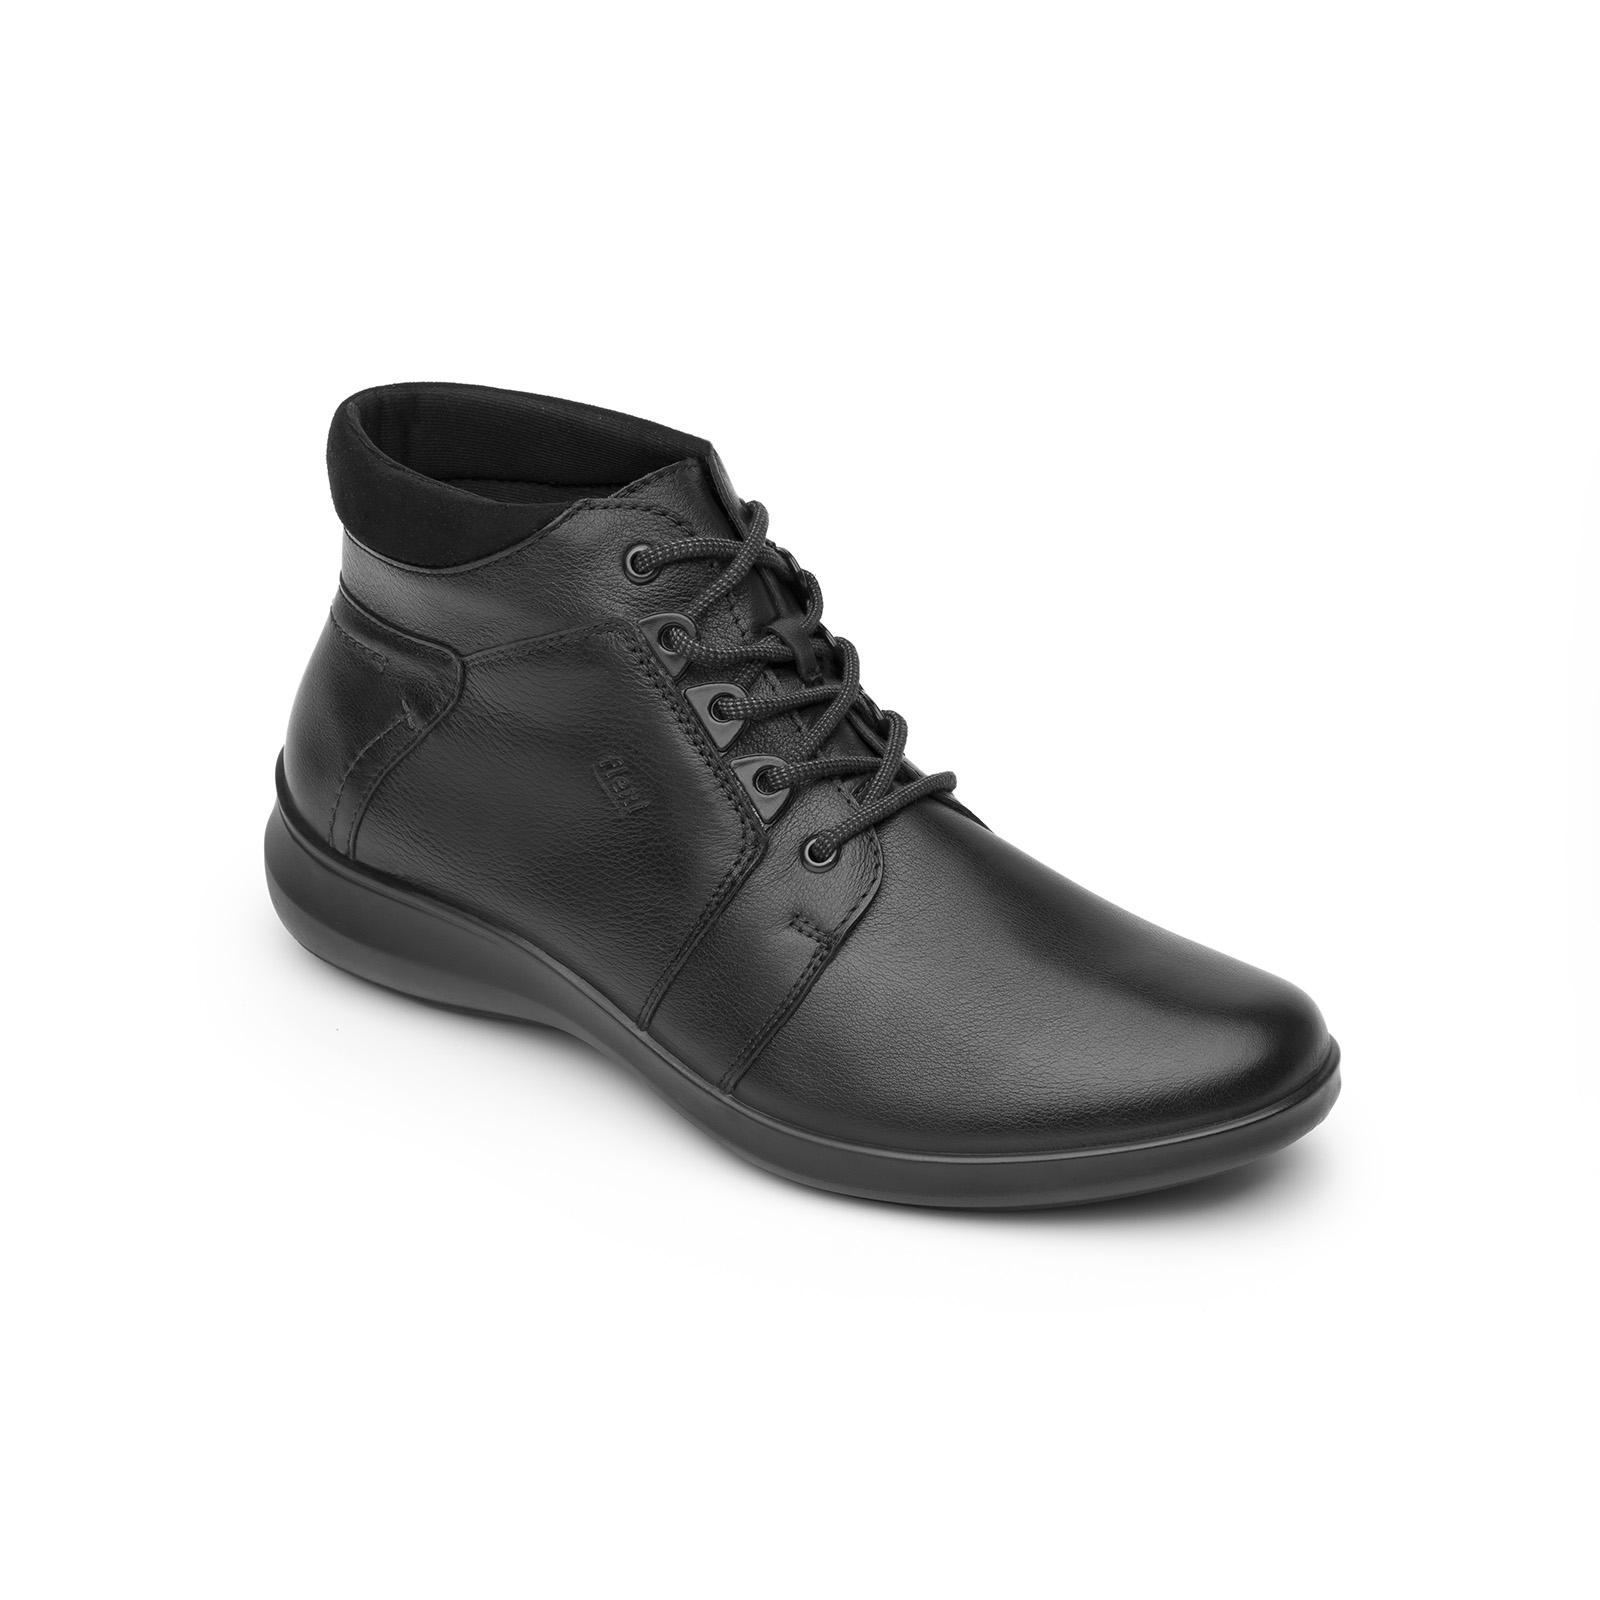 b0caf64231 Botas para Dama Flexi al mejor precio - Zapatos Flexi México